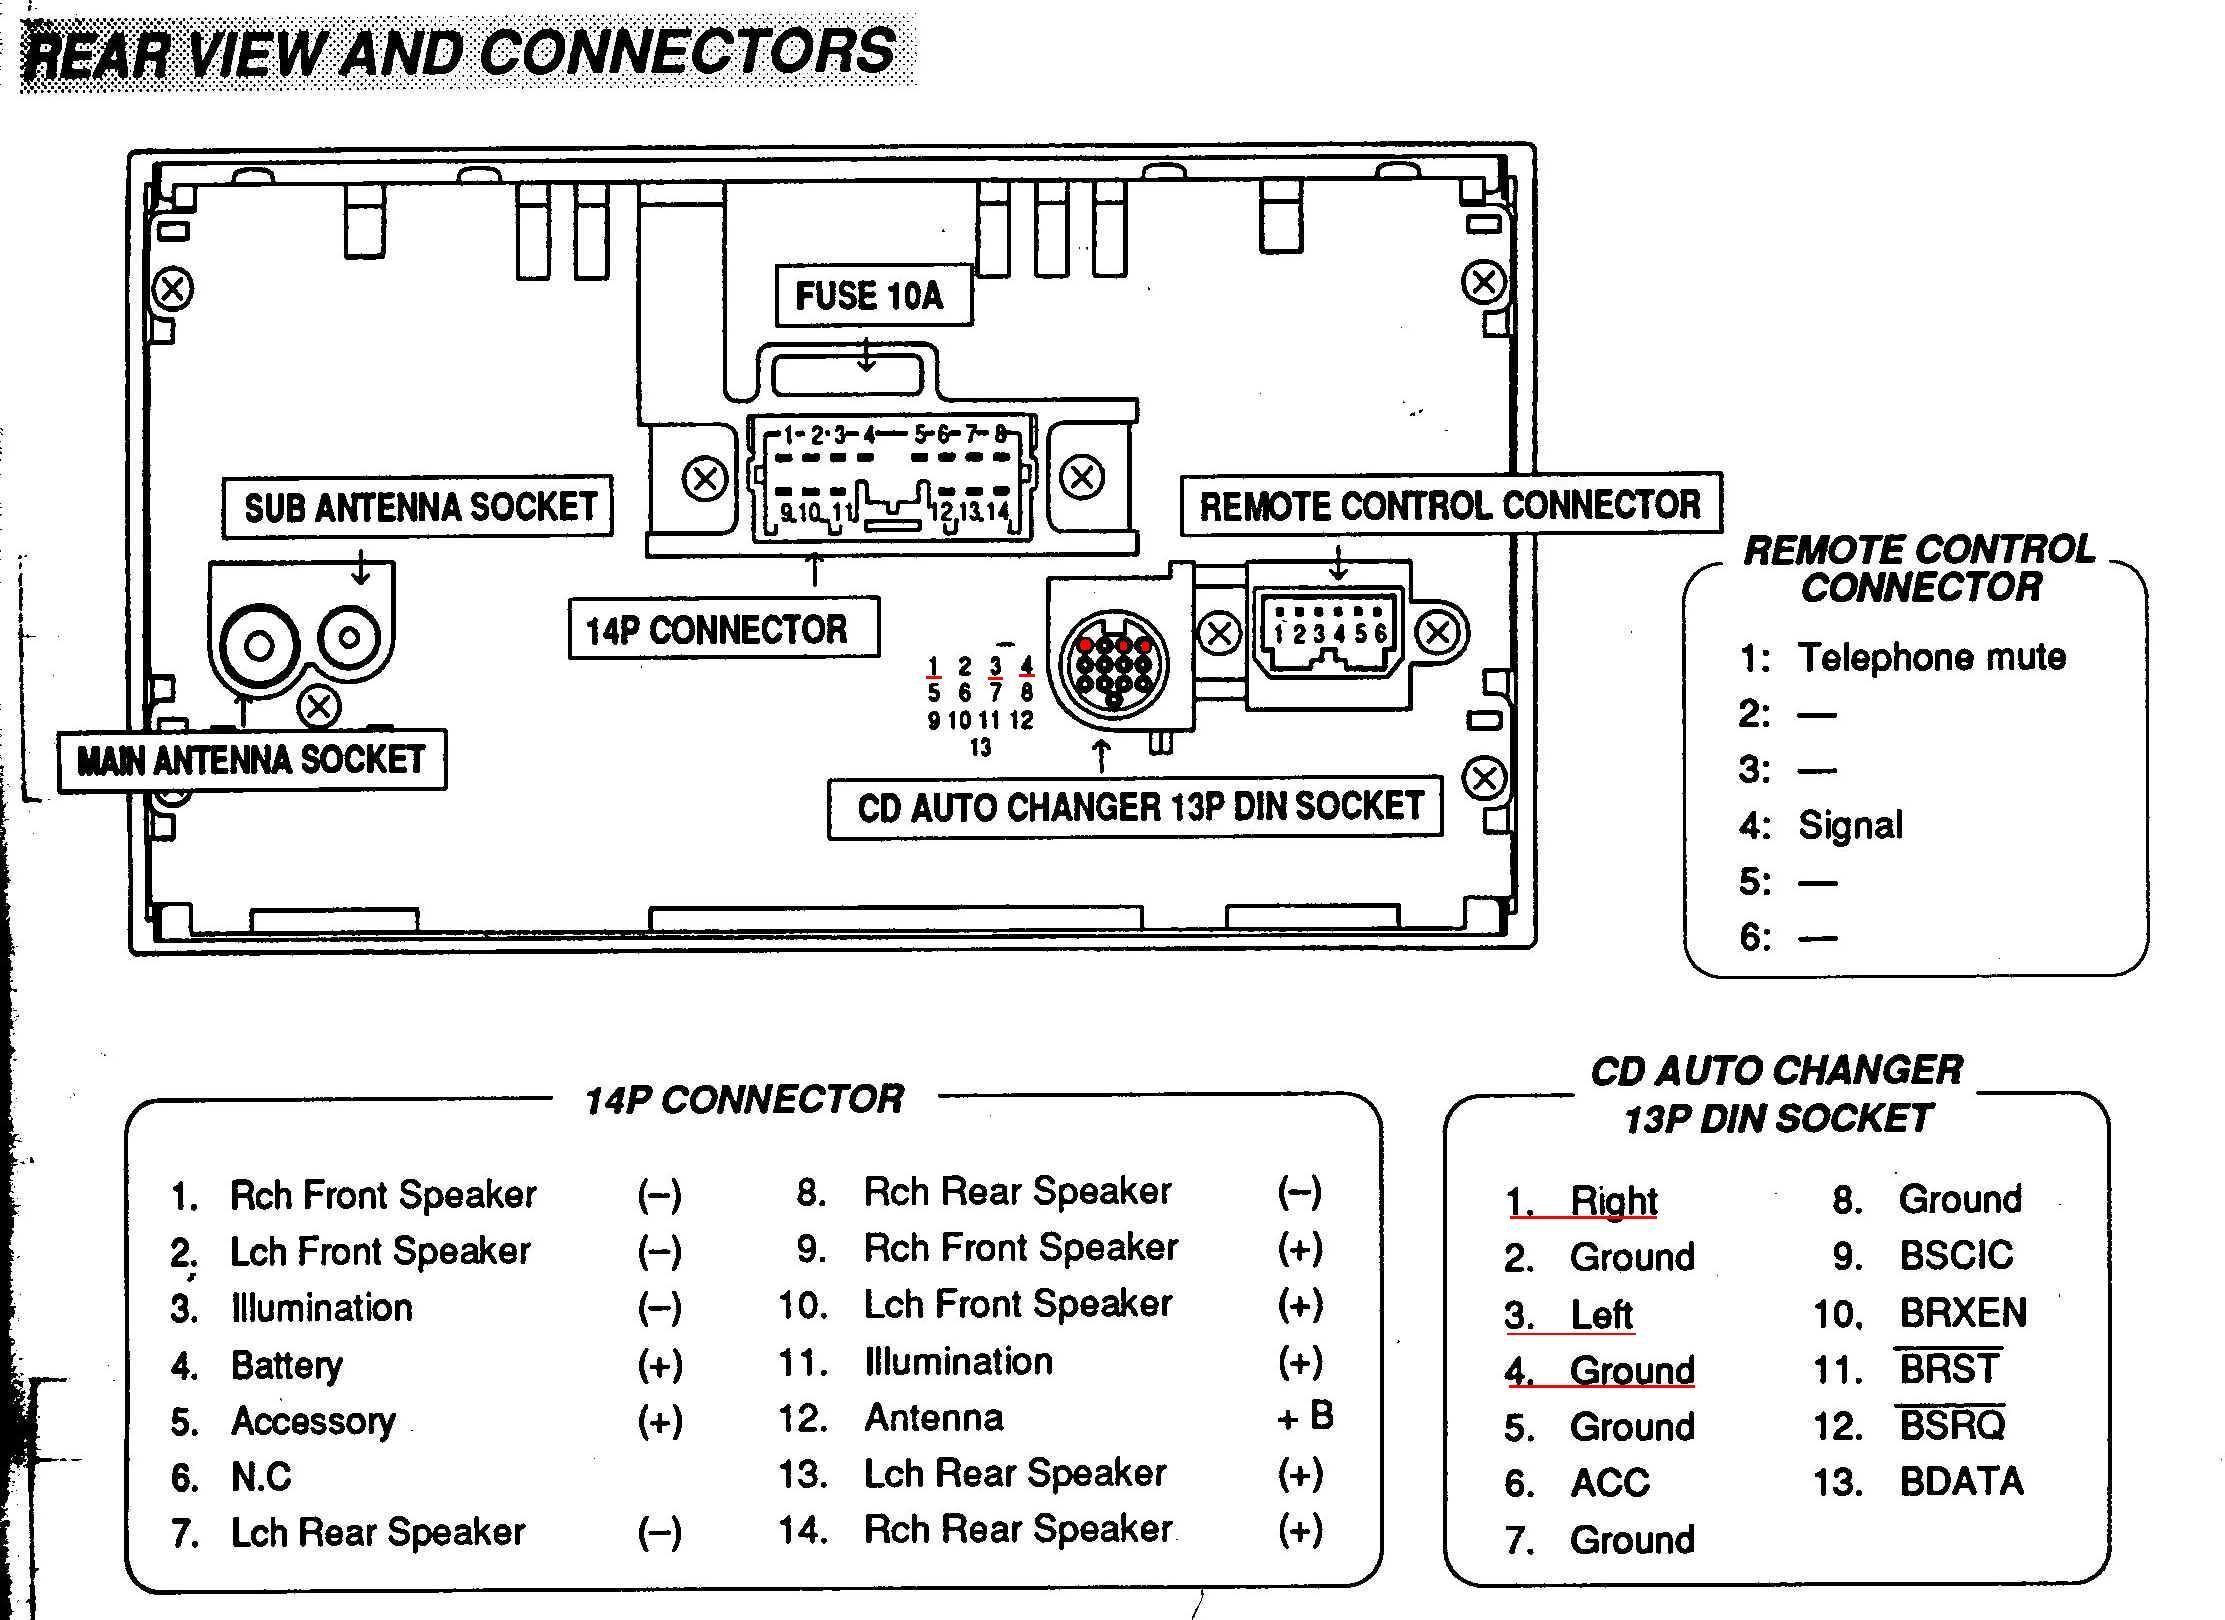 2000 Mitsubishi Montero Sport Stereo Wiring Download Radio Wiring Diagram For Mitsubishi Montero Sport At